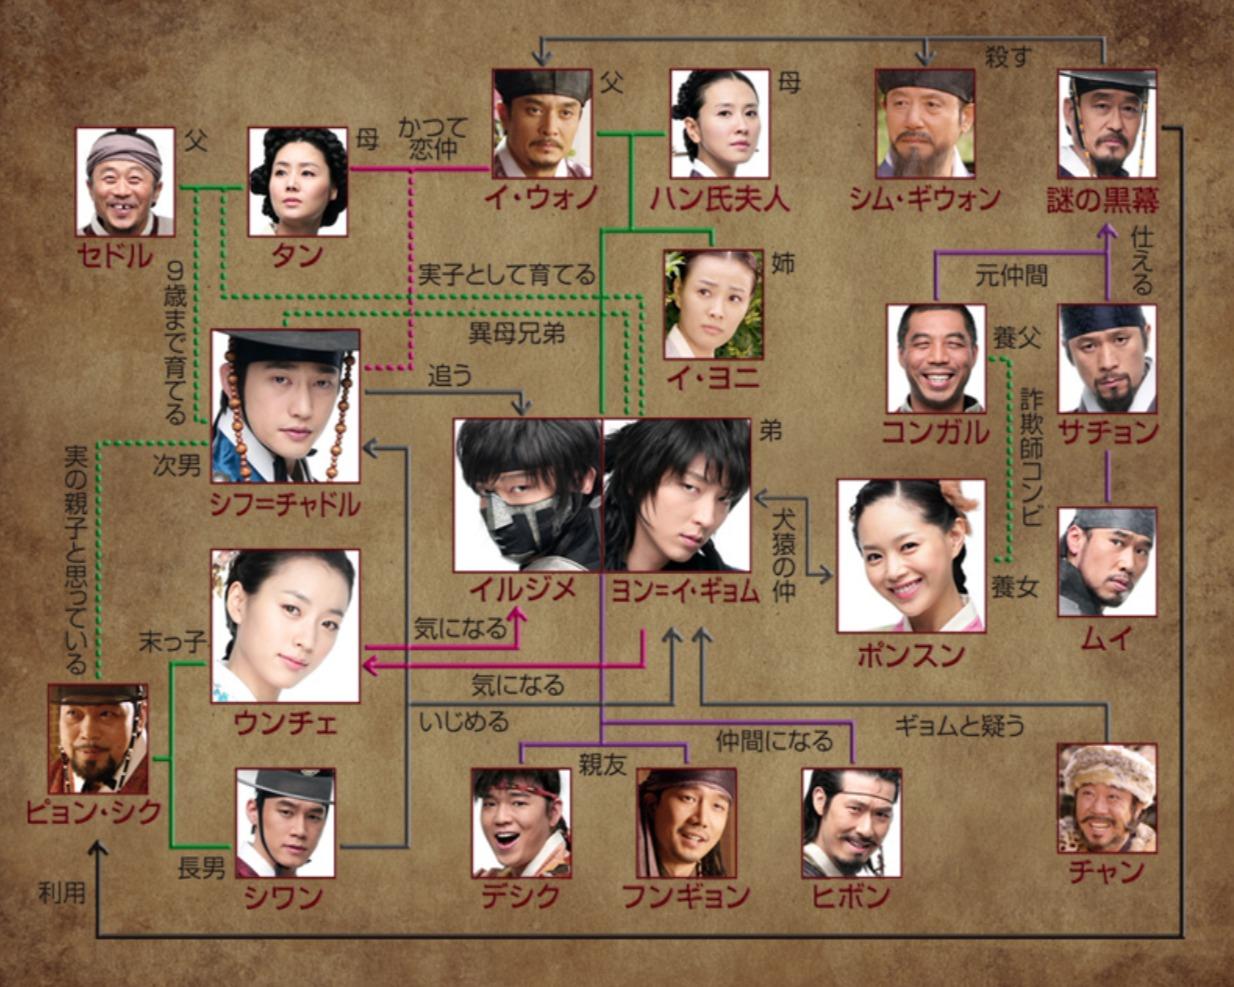 韓国ドラマ『△邦題』登場人物相関図(関係図)